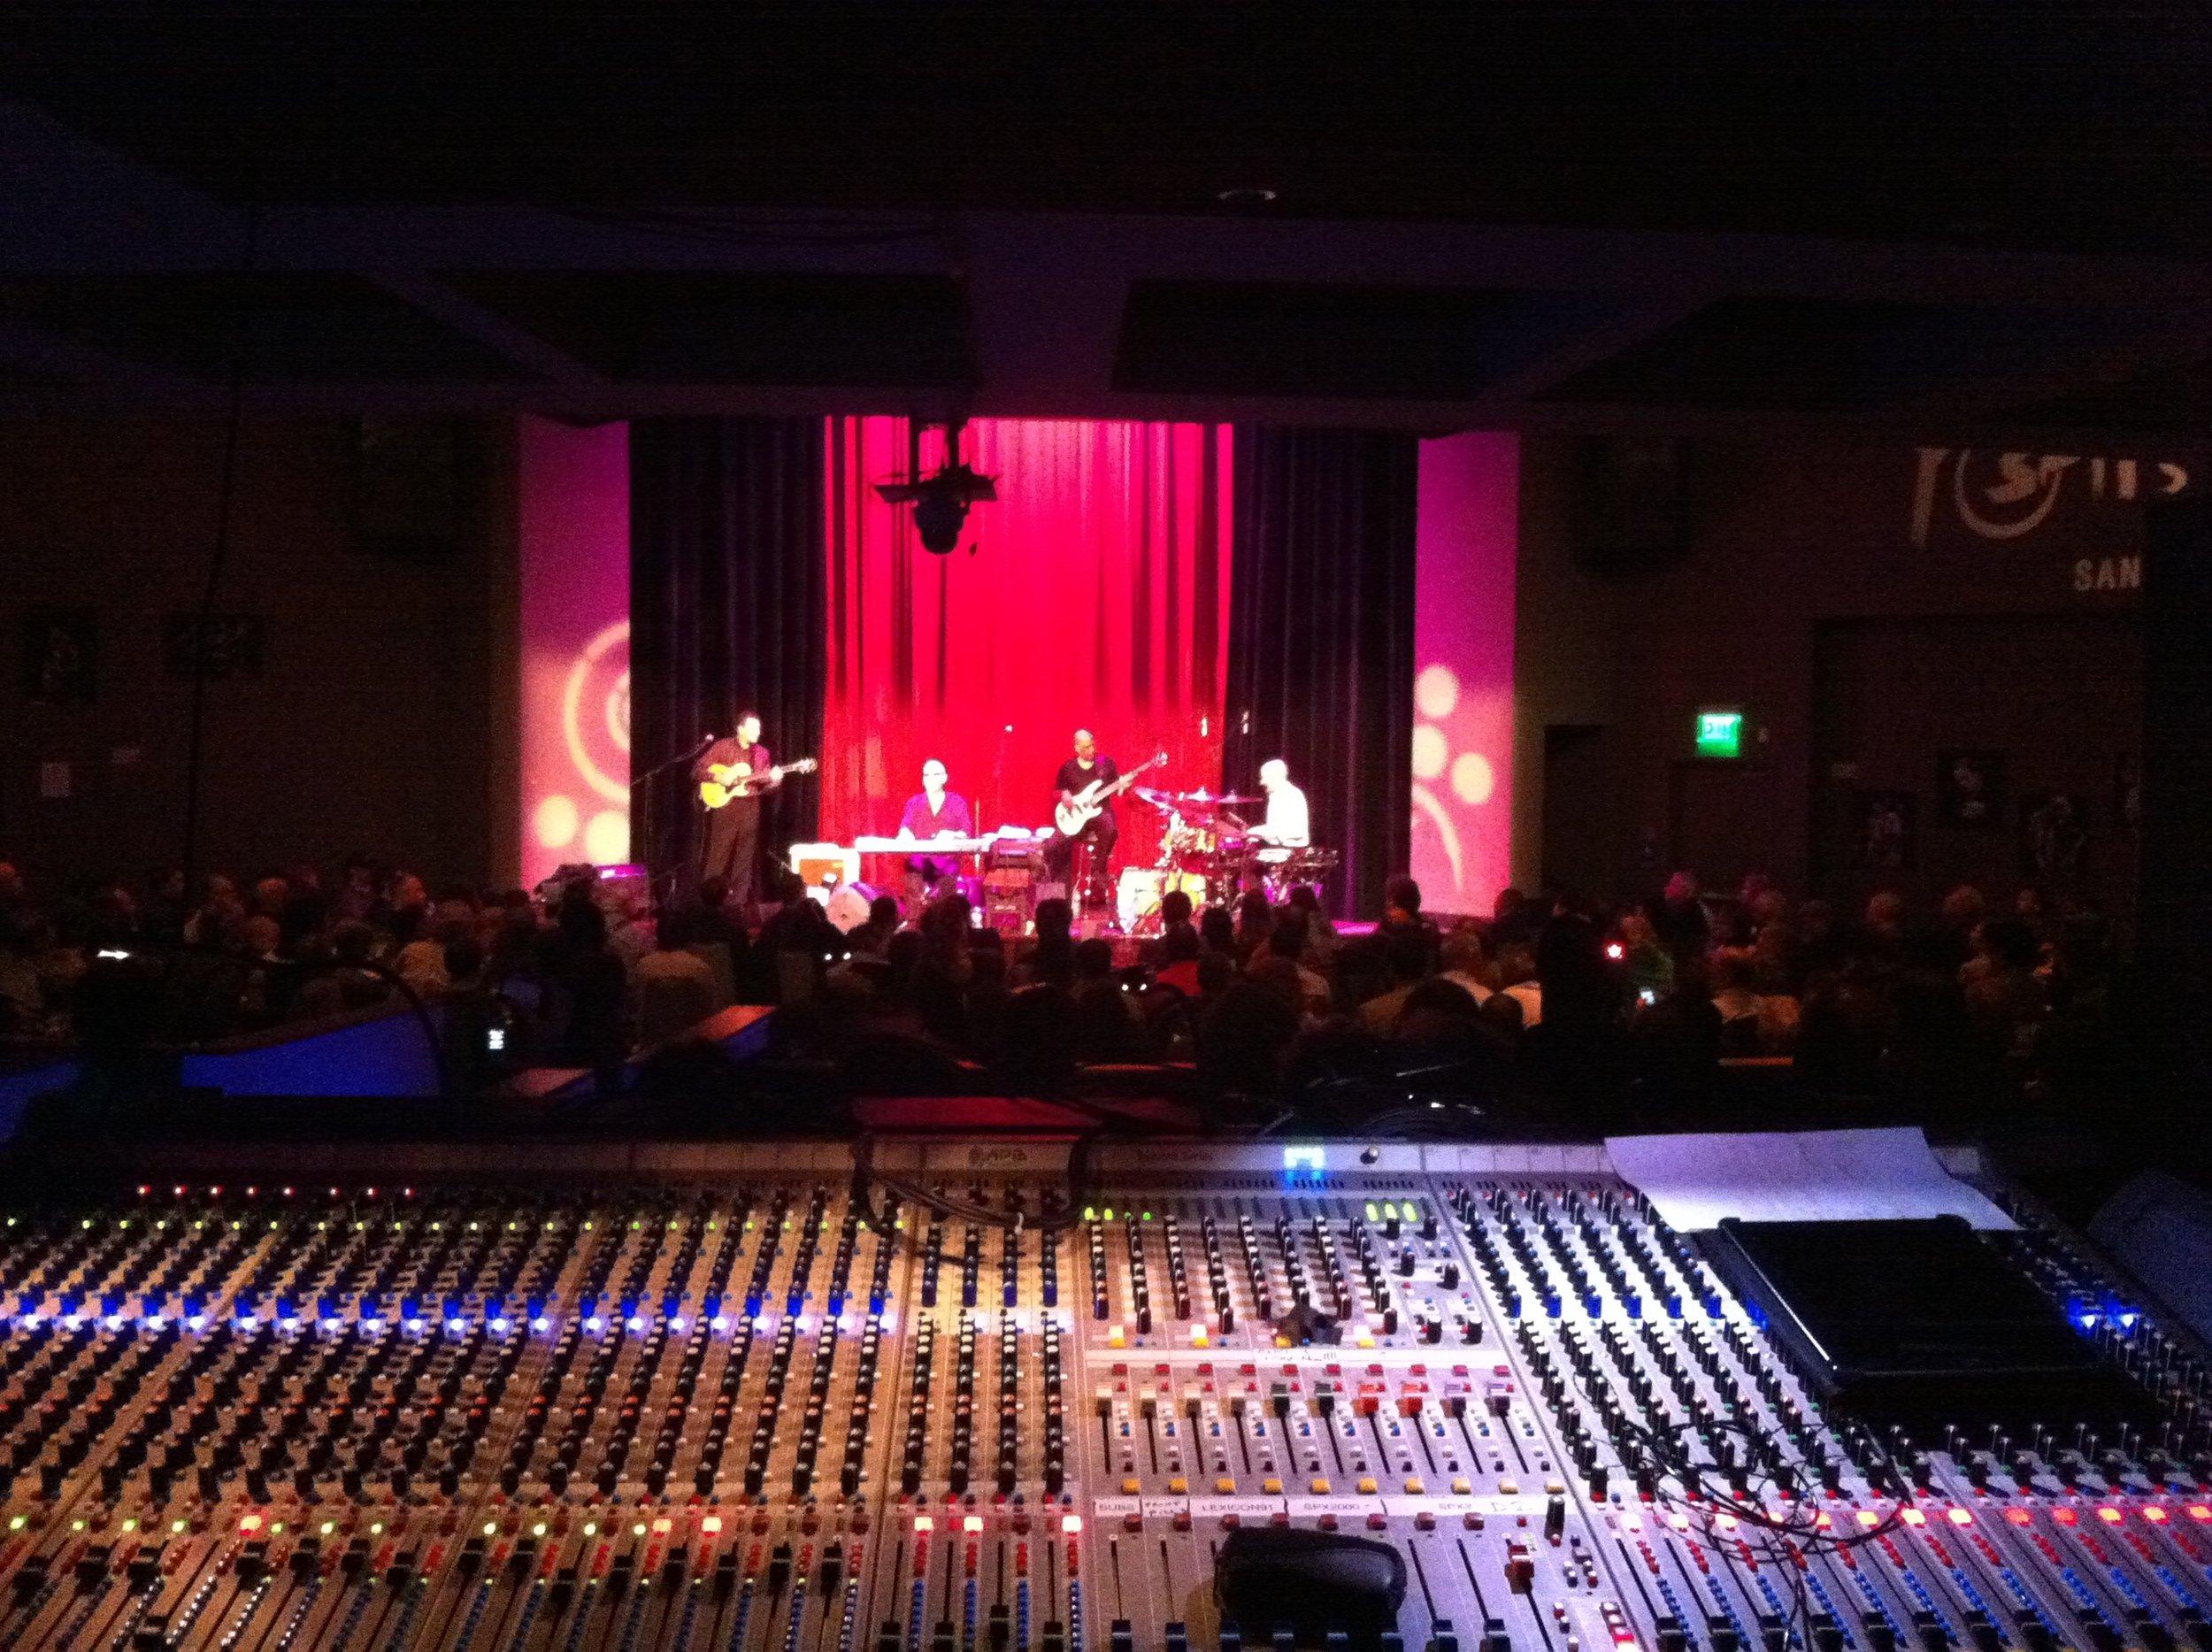 2012 Fall Vital Information Tour